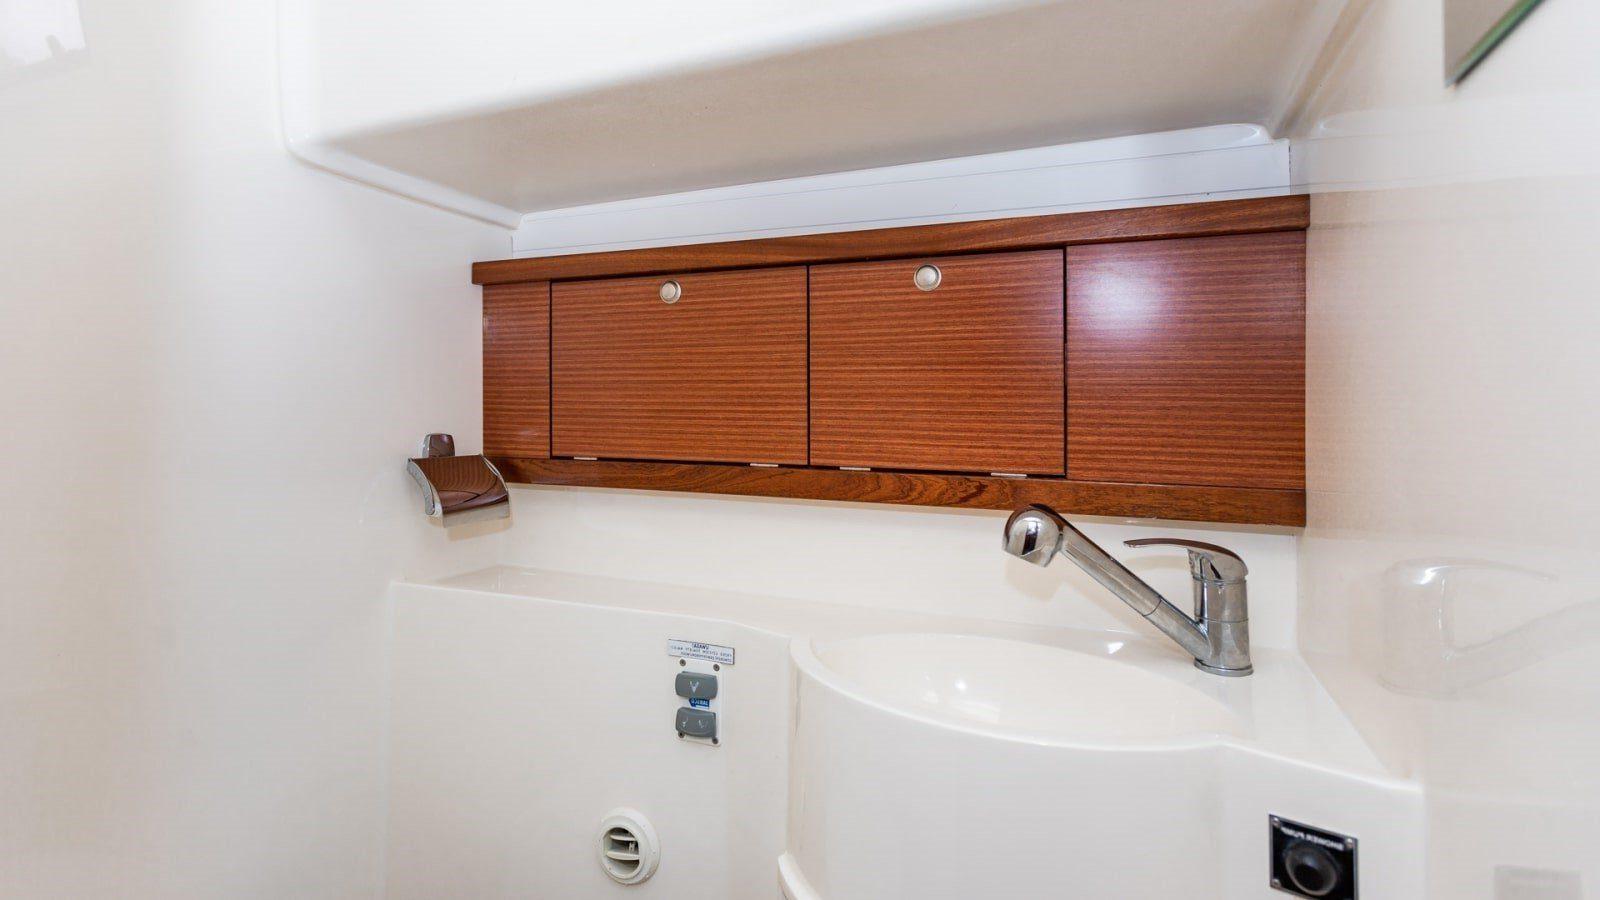 jacht łazienka czarter houseboat